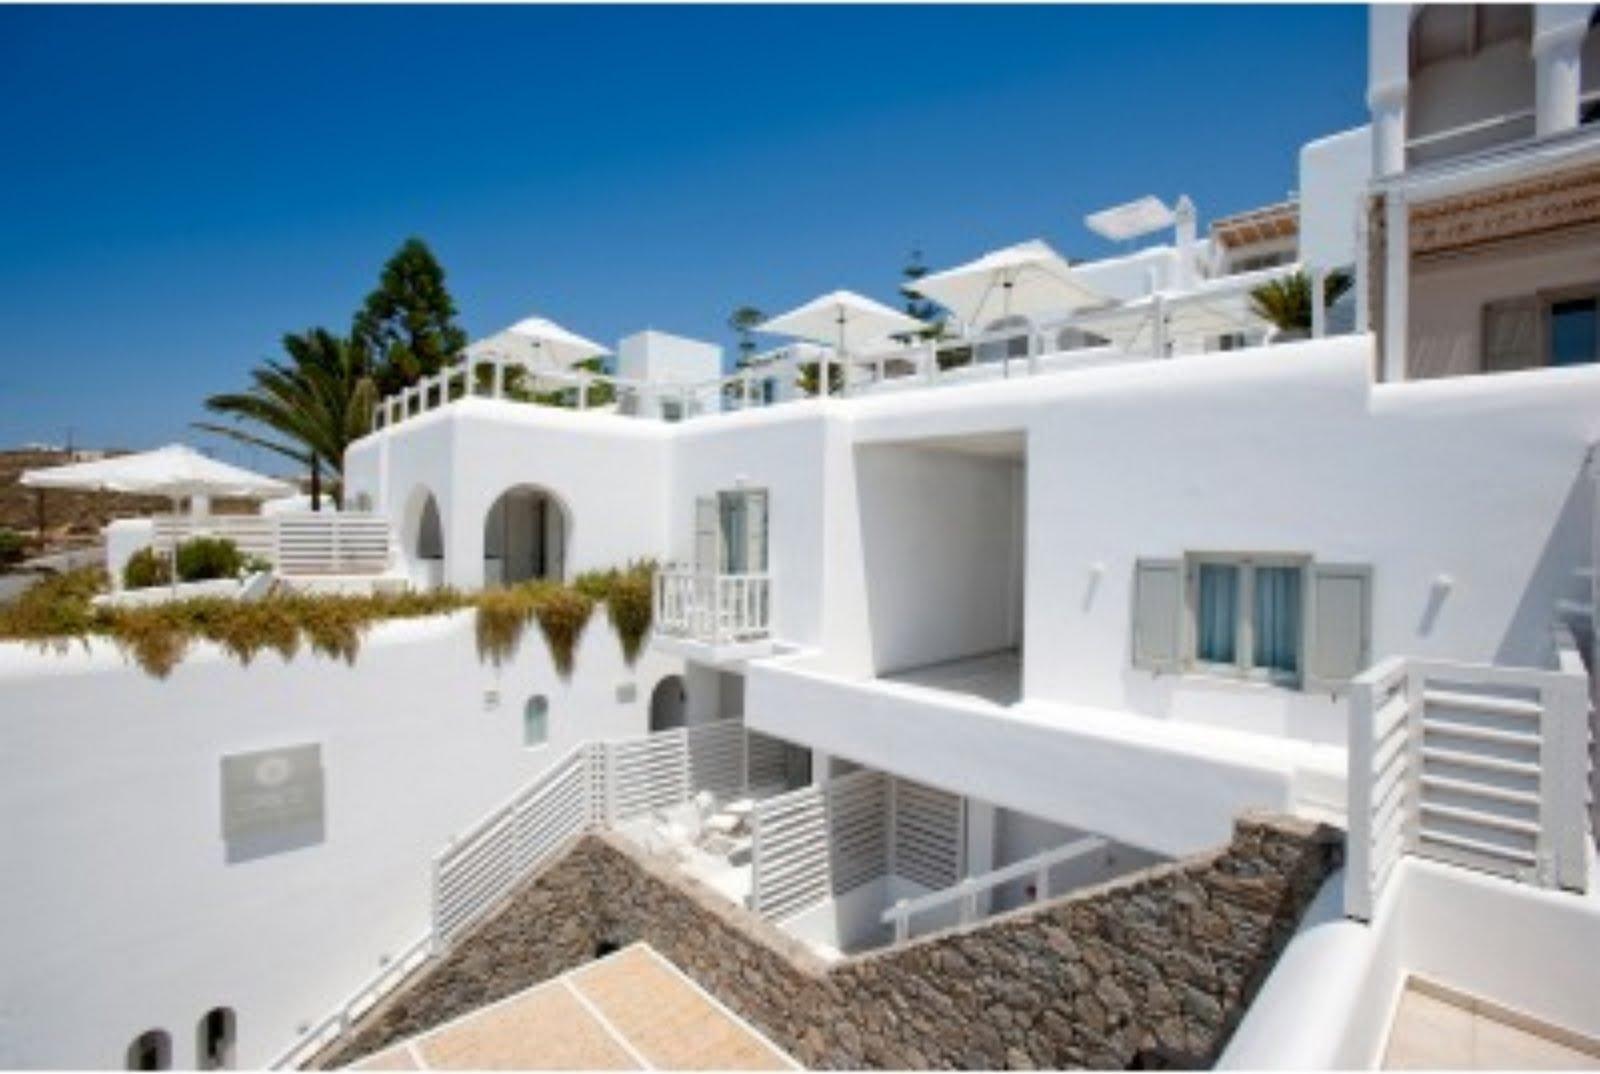 Lime meadow travelling in style mykonos greece for Top design hotels mykonos